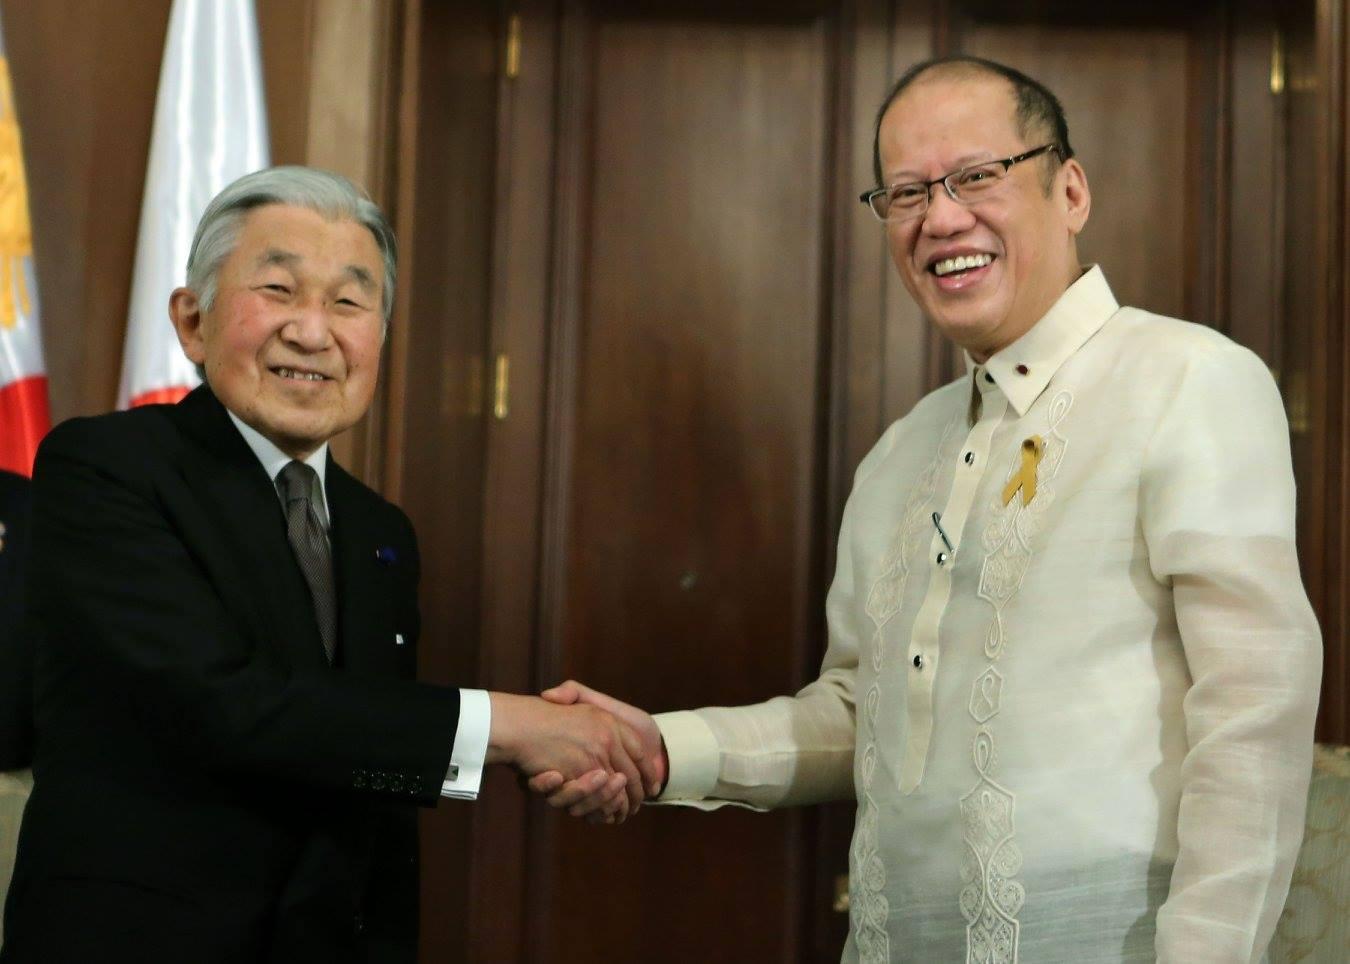 President Benigno S. Aquino III welcomes Their Imperial Majesties the Emperor Akihito and the Empress Michiko of Japan to Malacañan Palace. (Photos courtesy of Malacañang Photo Bureau)